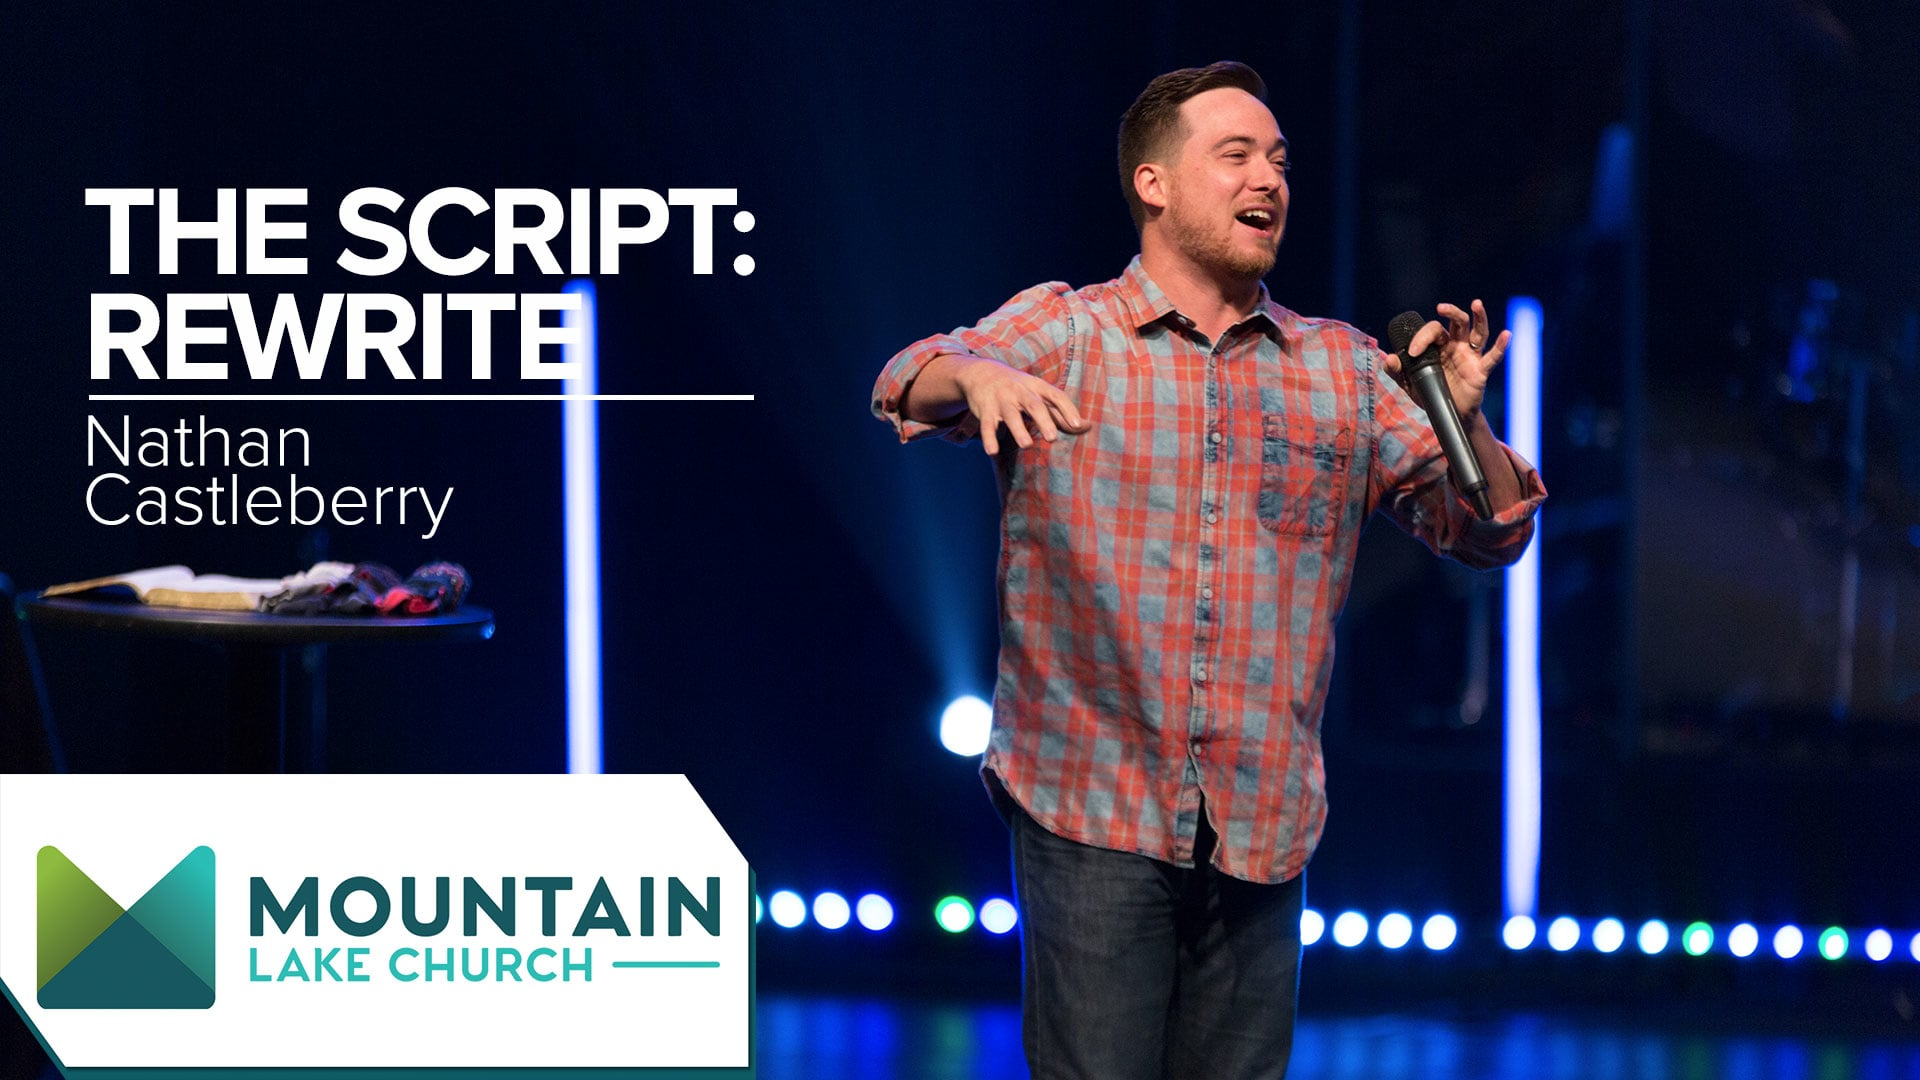 The Script: Rewrite